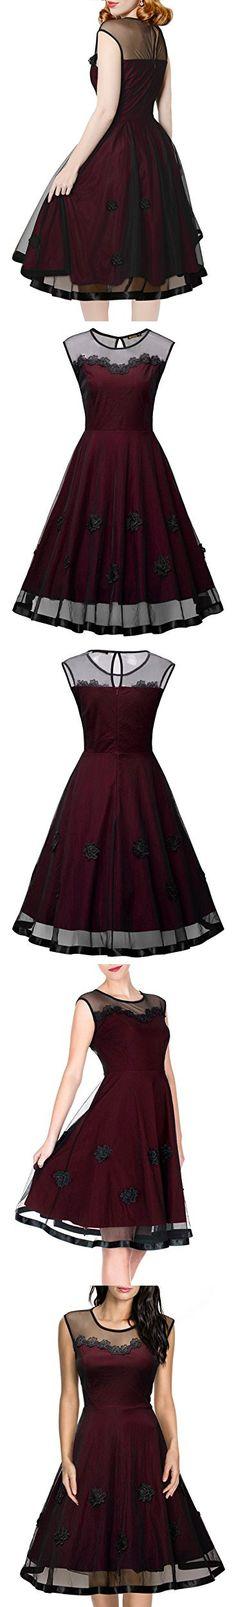 Miusol Women's Elegant Illusion Floral Lace Cap Sleeve Bridesmaid Prom Dress (Large, Wine)